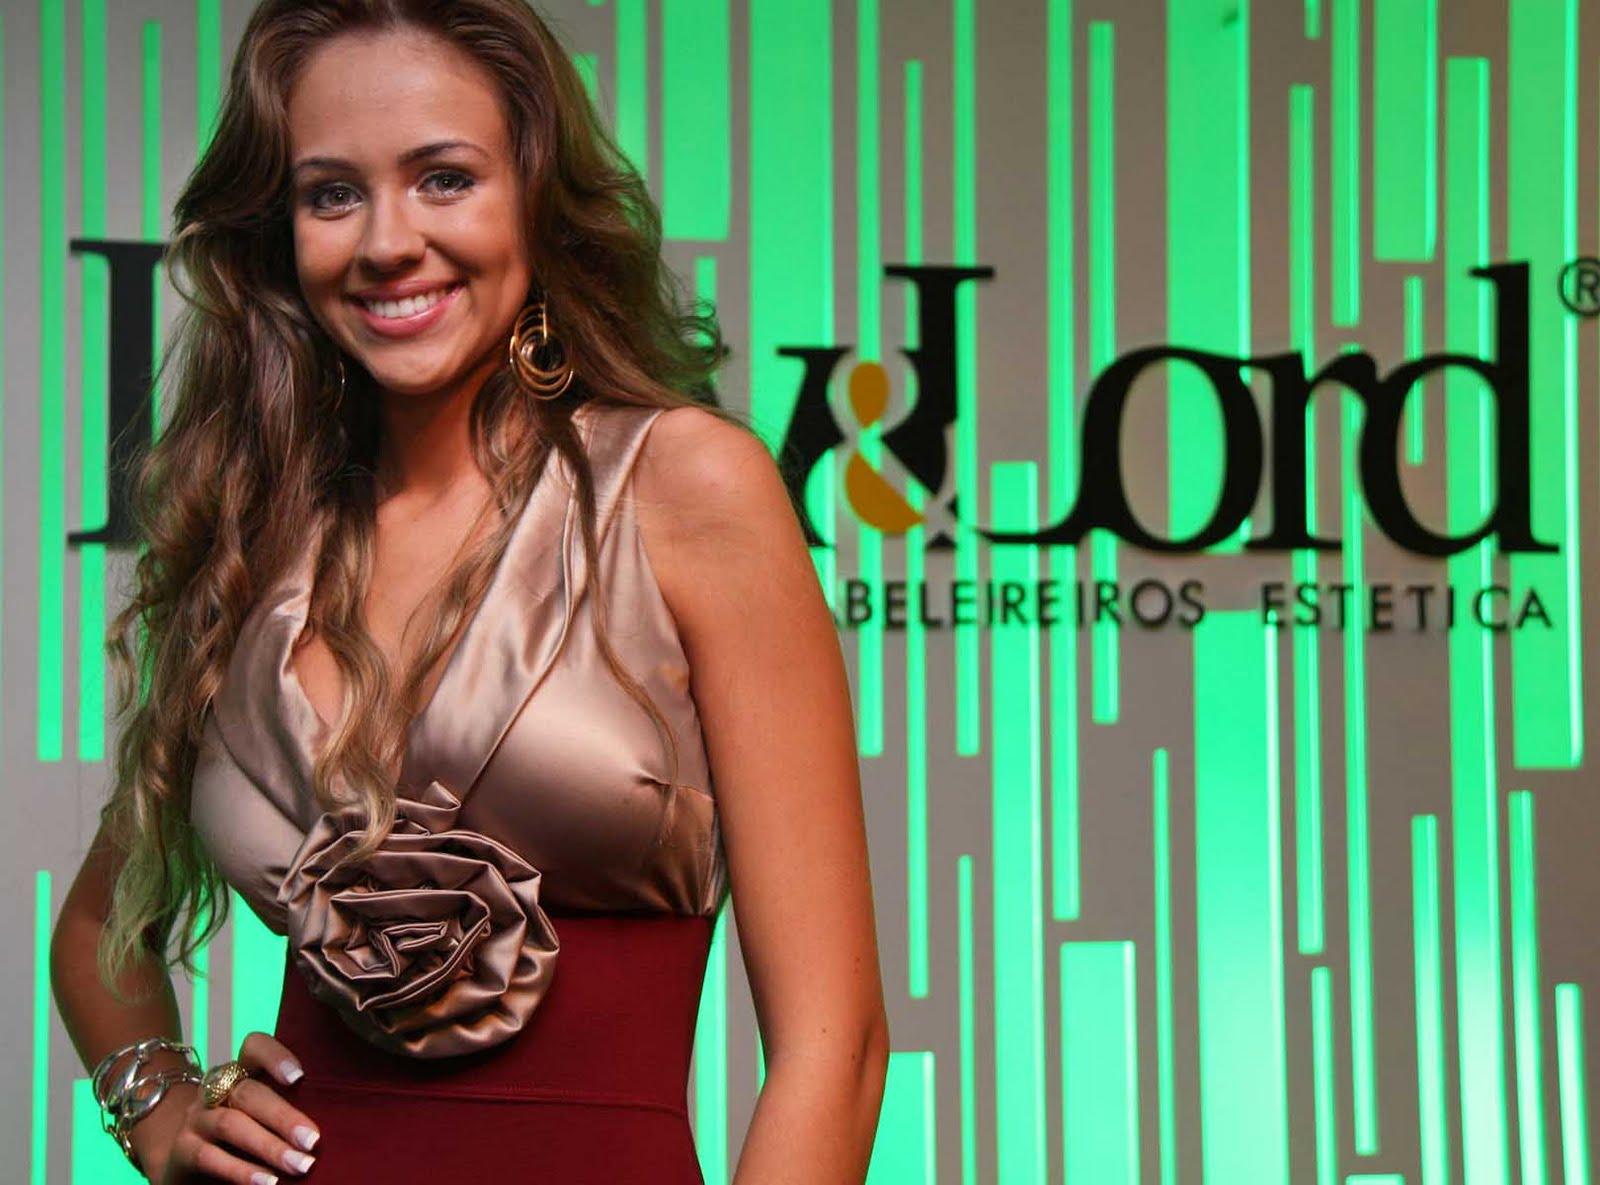 marylia bernardt, miss brasil continente americano 2010. - Página 2 3wfsokq3